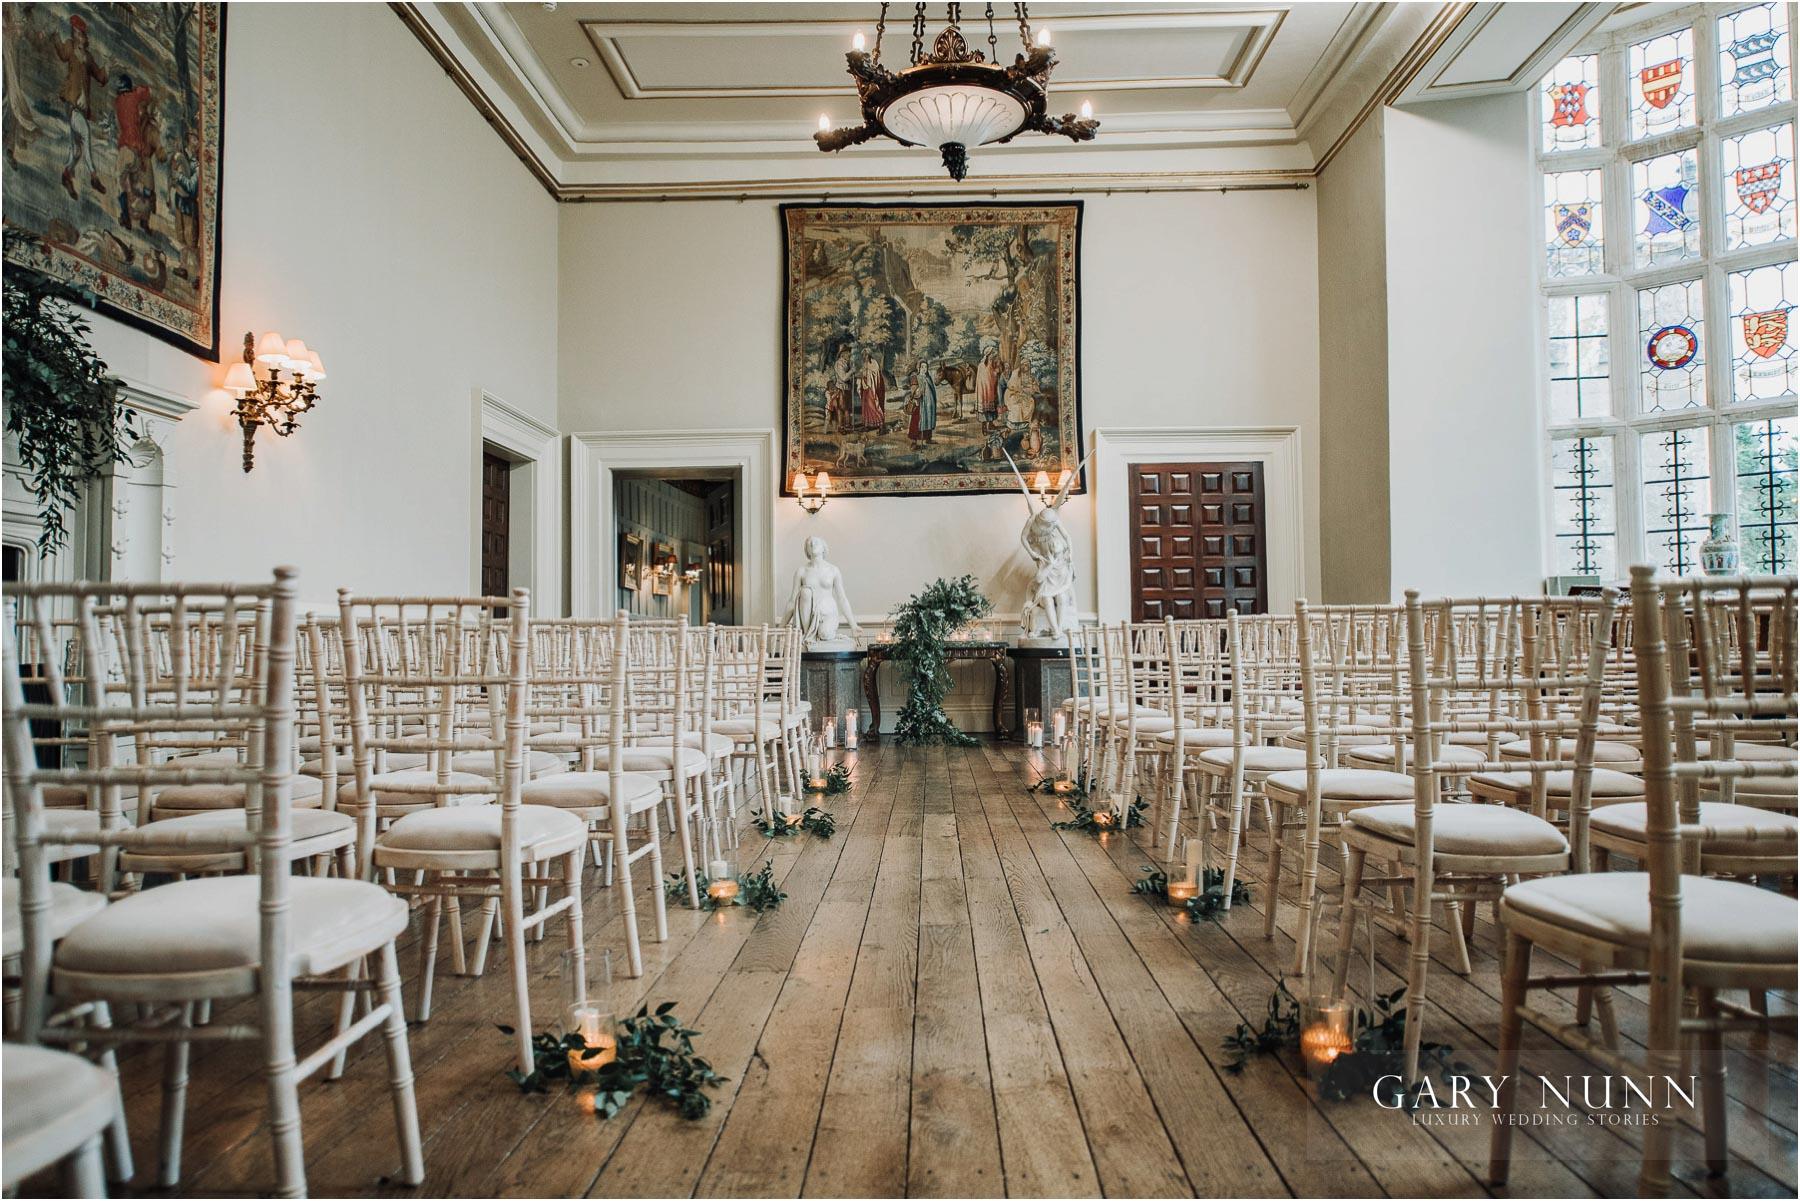 elmore court, gay wedding, wedding photographer gloucester, wedding photographer milton keynes